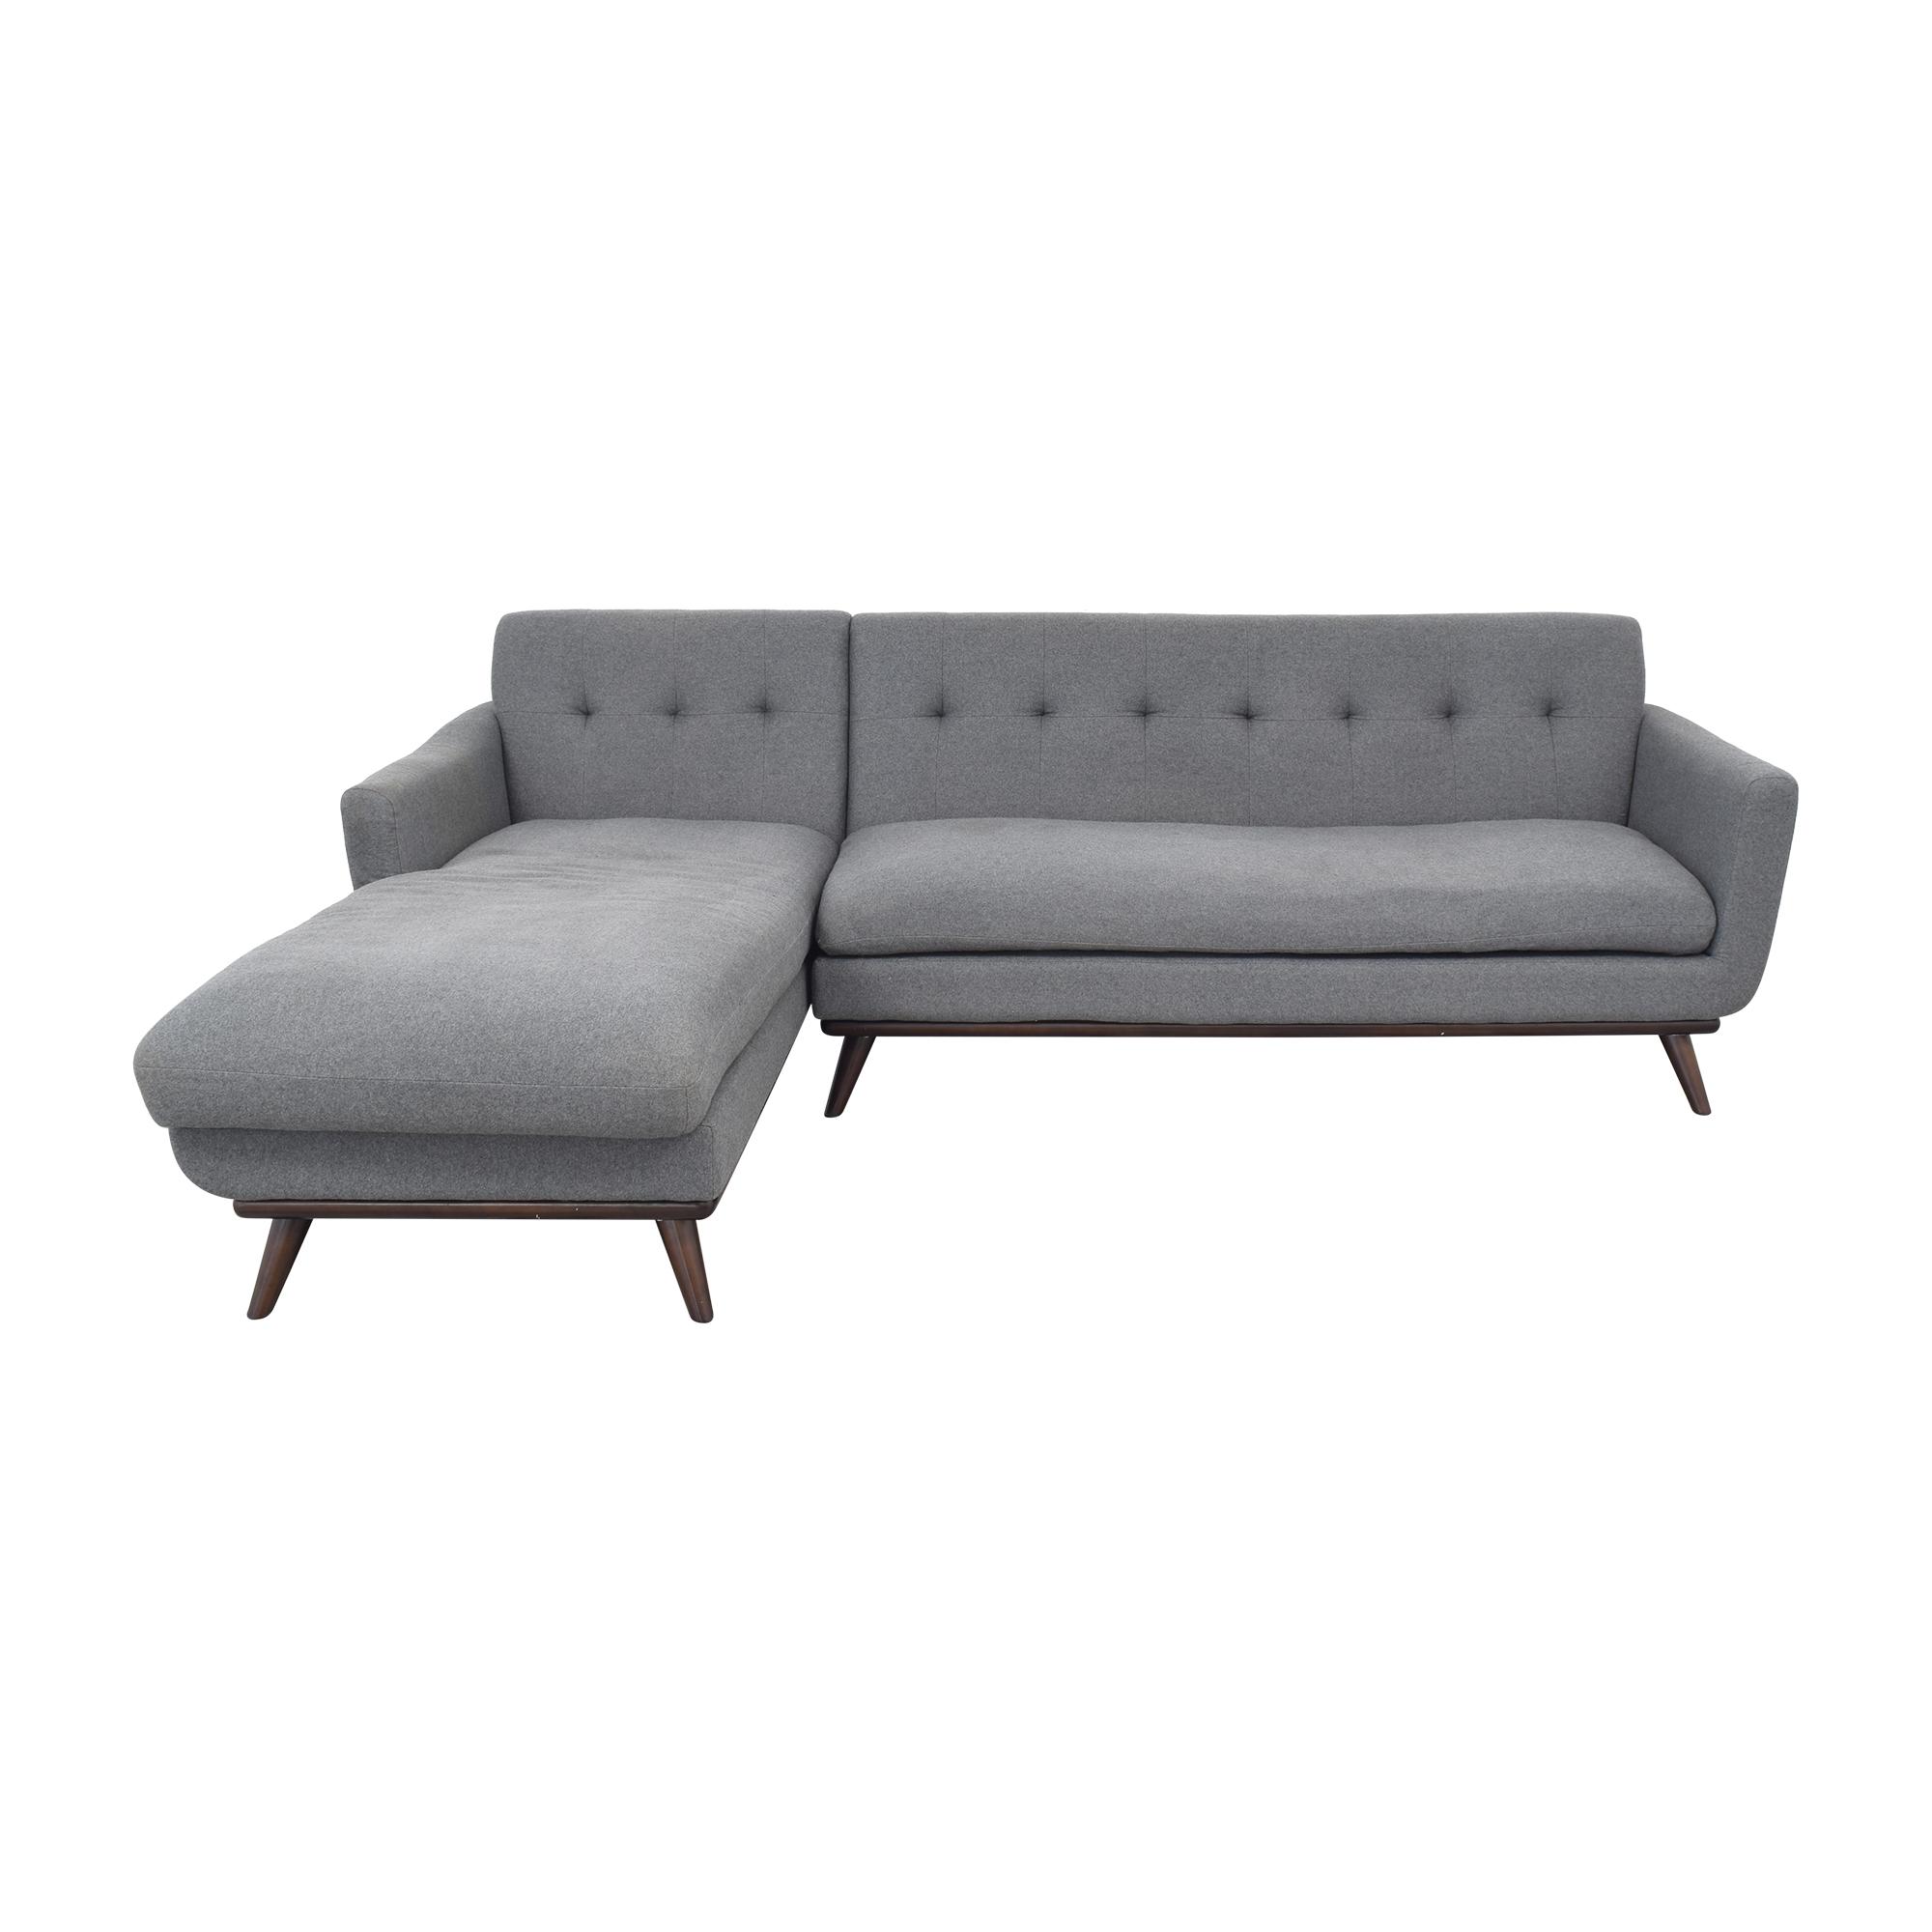 Kardiel Kardiel Jackie Modern Right Facing Sectional Sofa dimensions